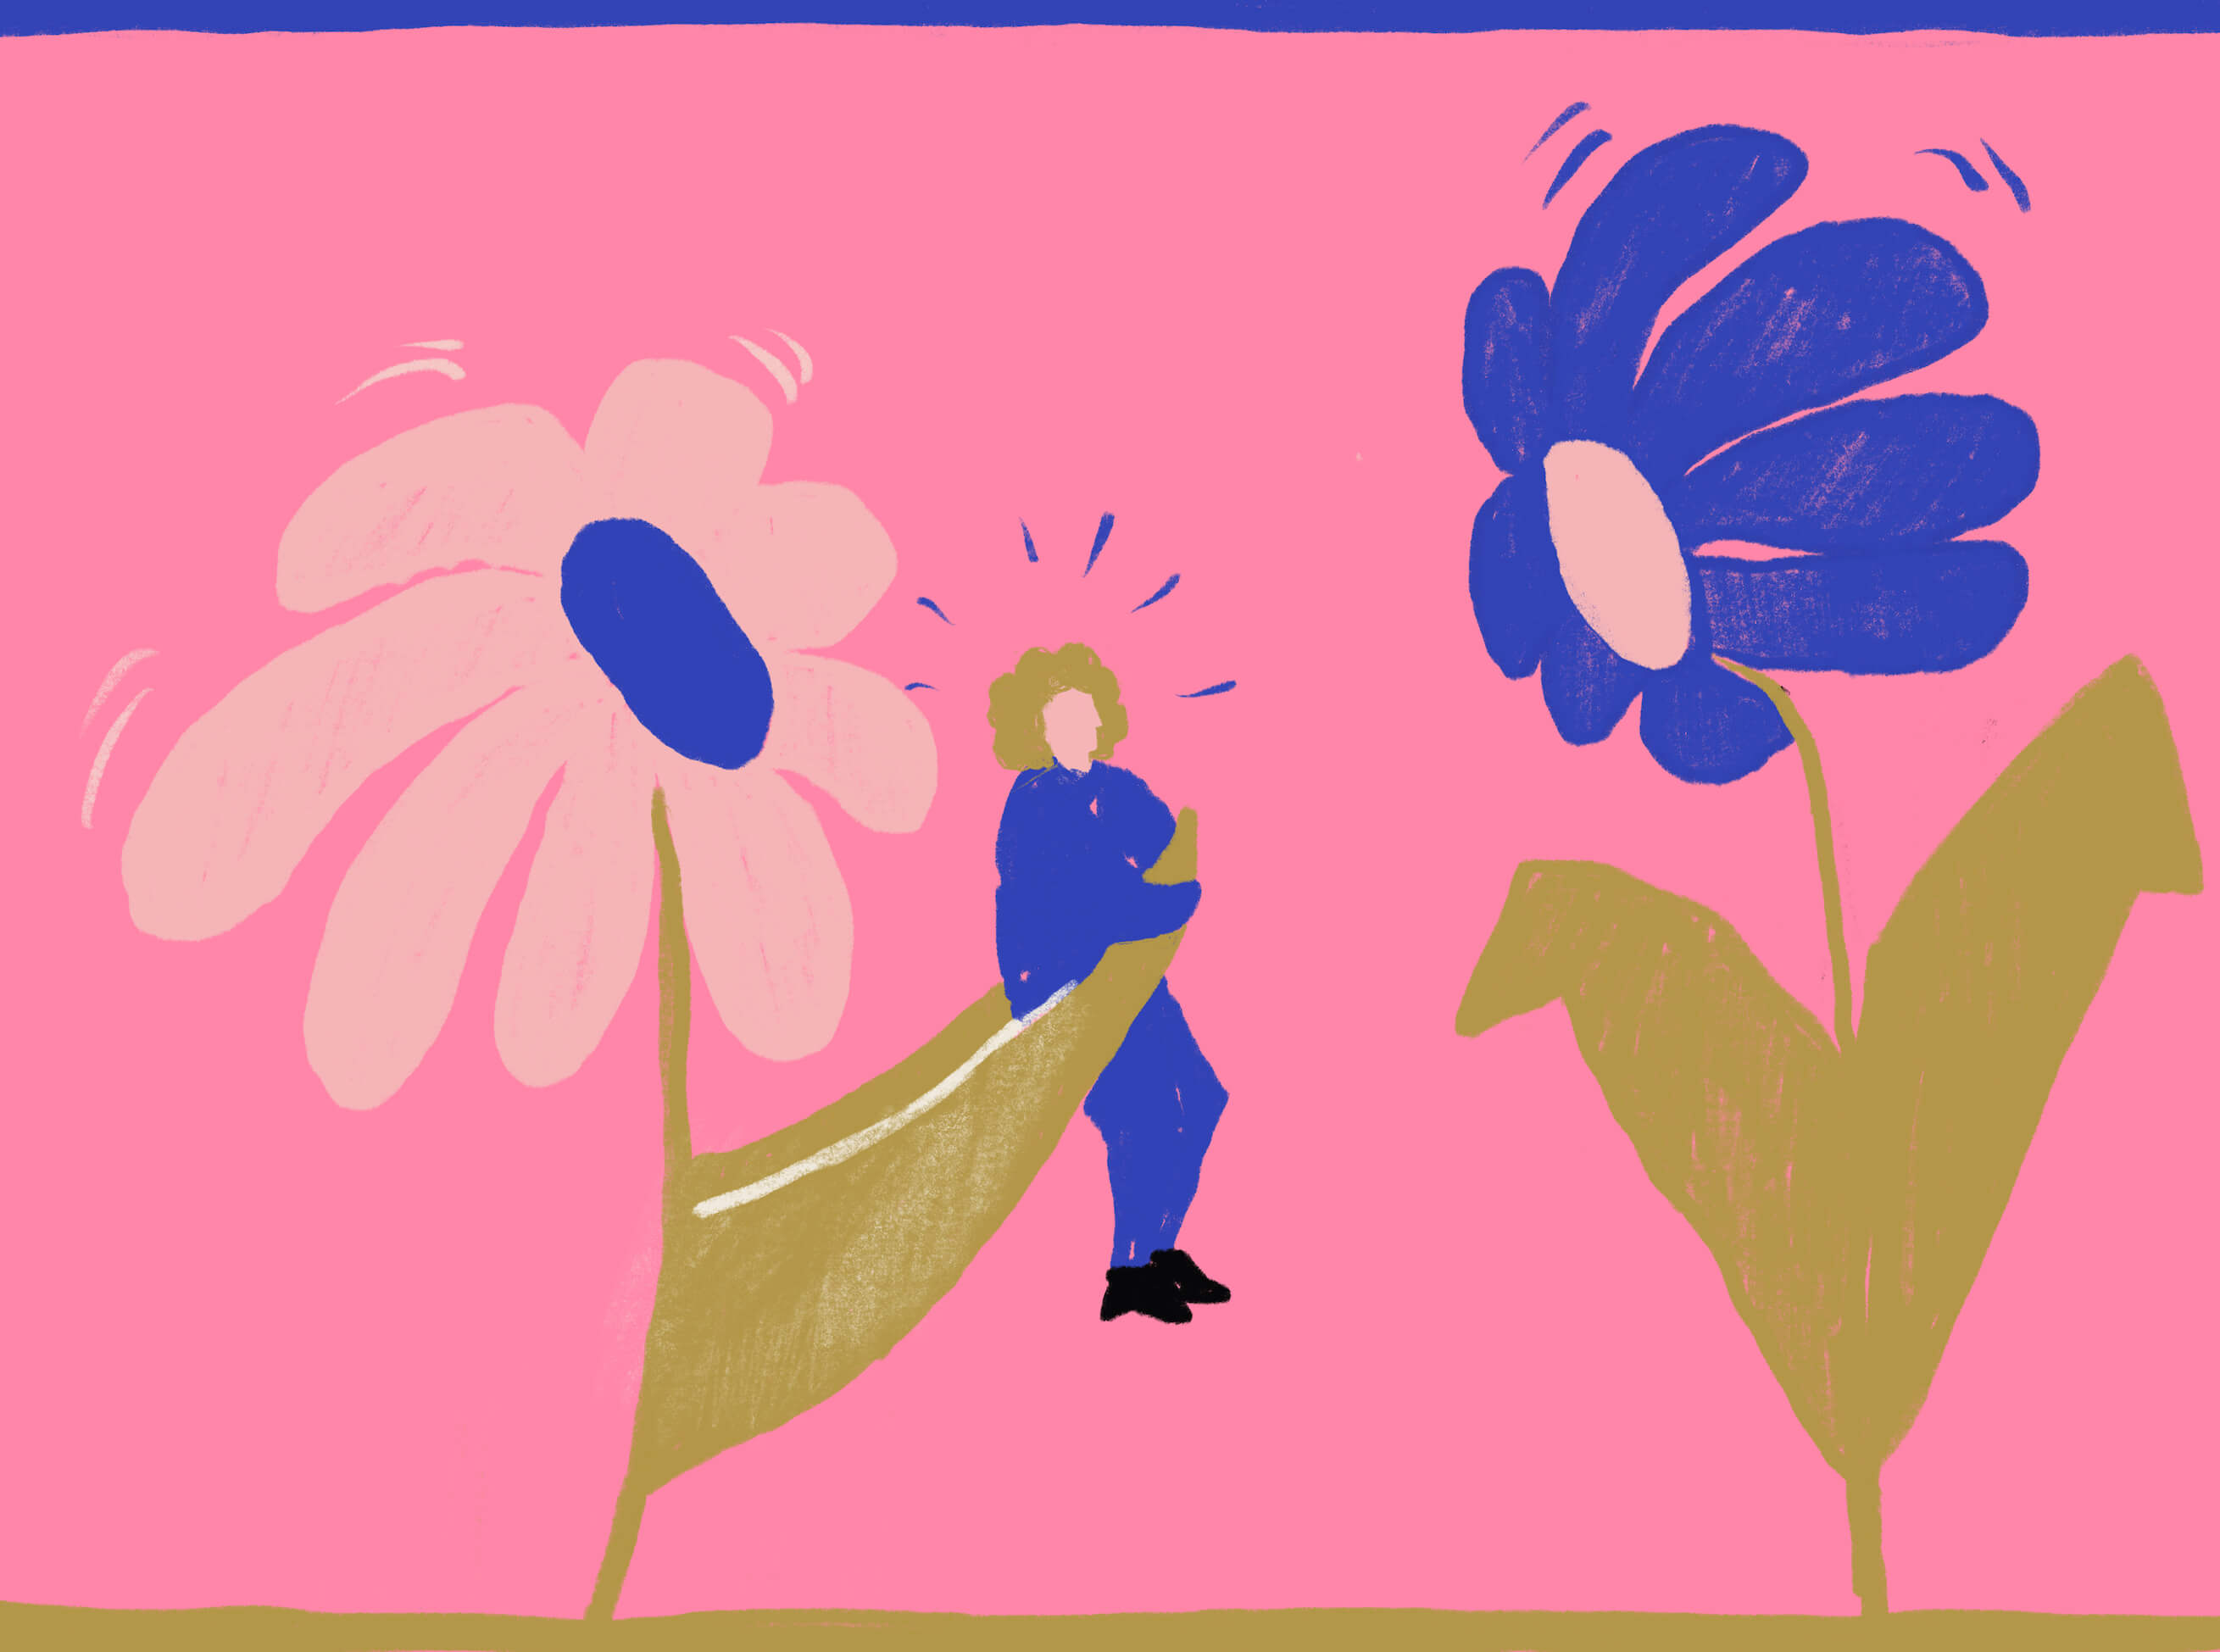 Flowers of Solidarity (alternate version) main image